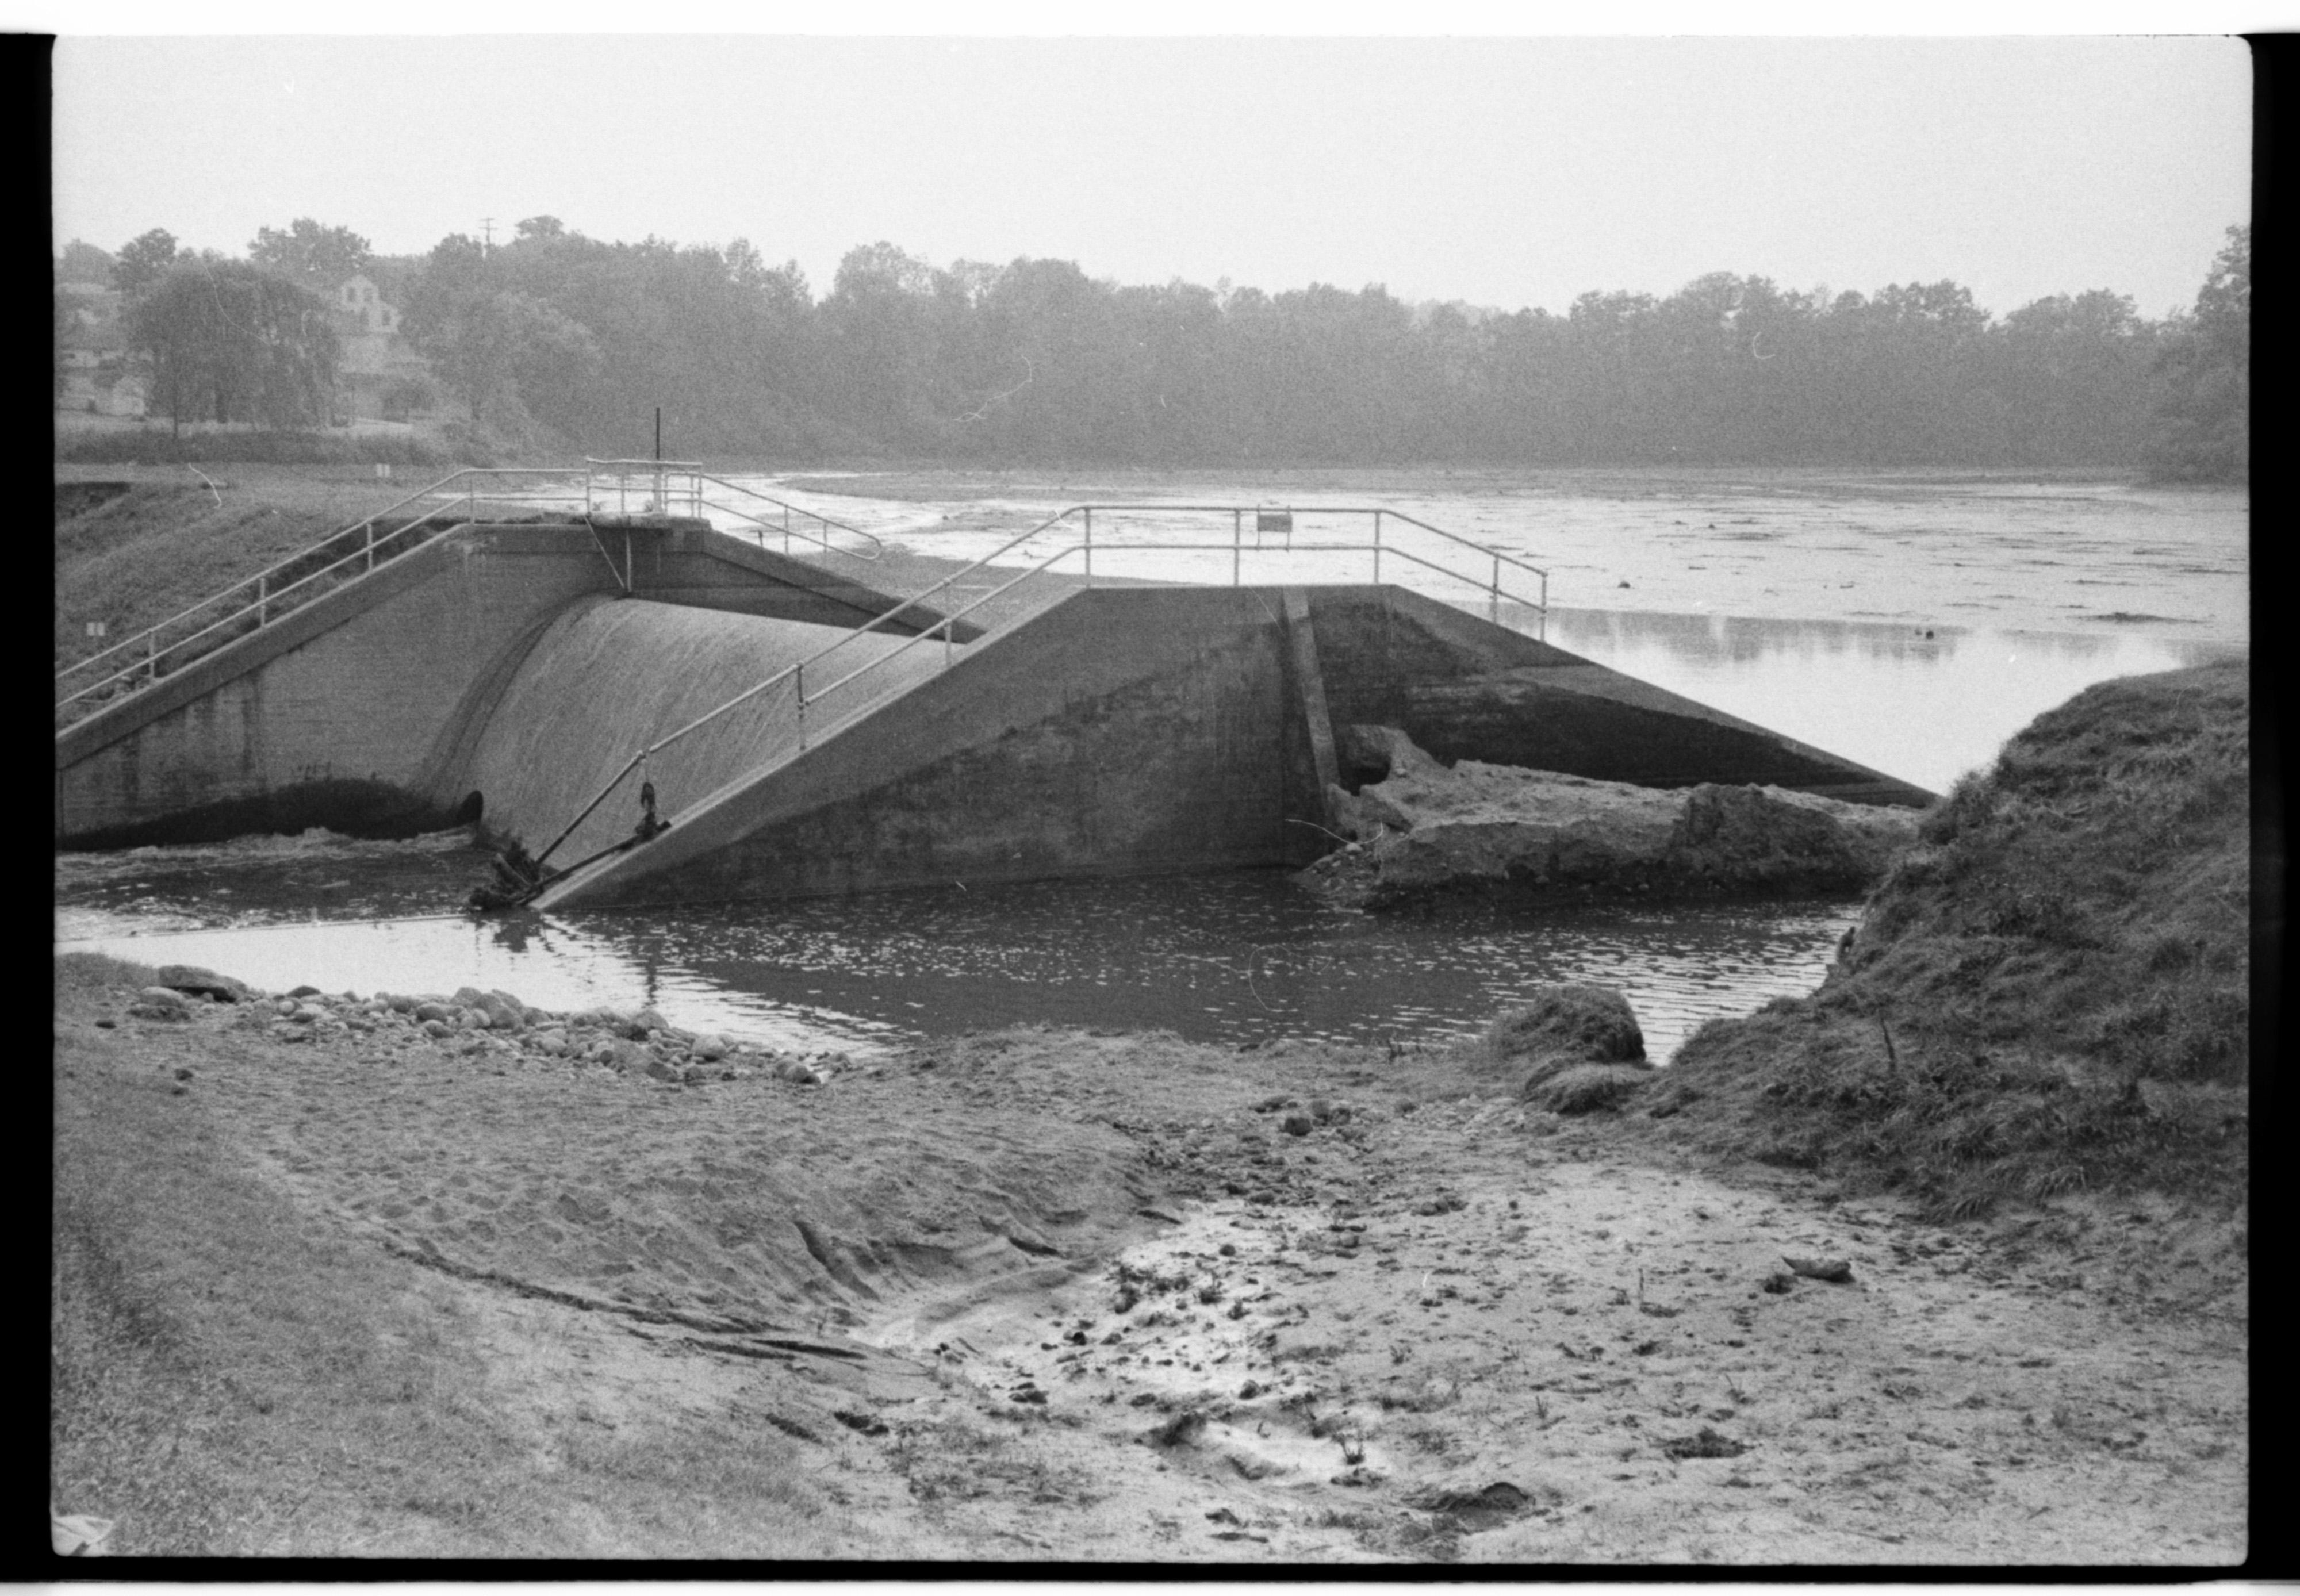 Saline River Dam Break, June 1968 Flood   Ann Arbor District